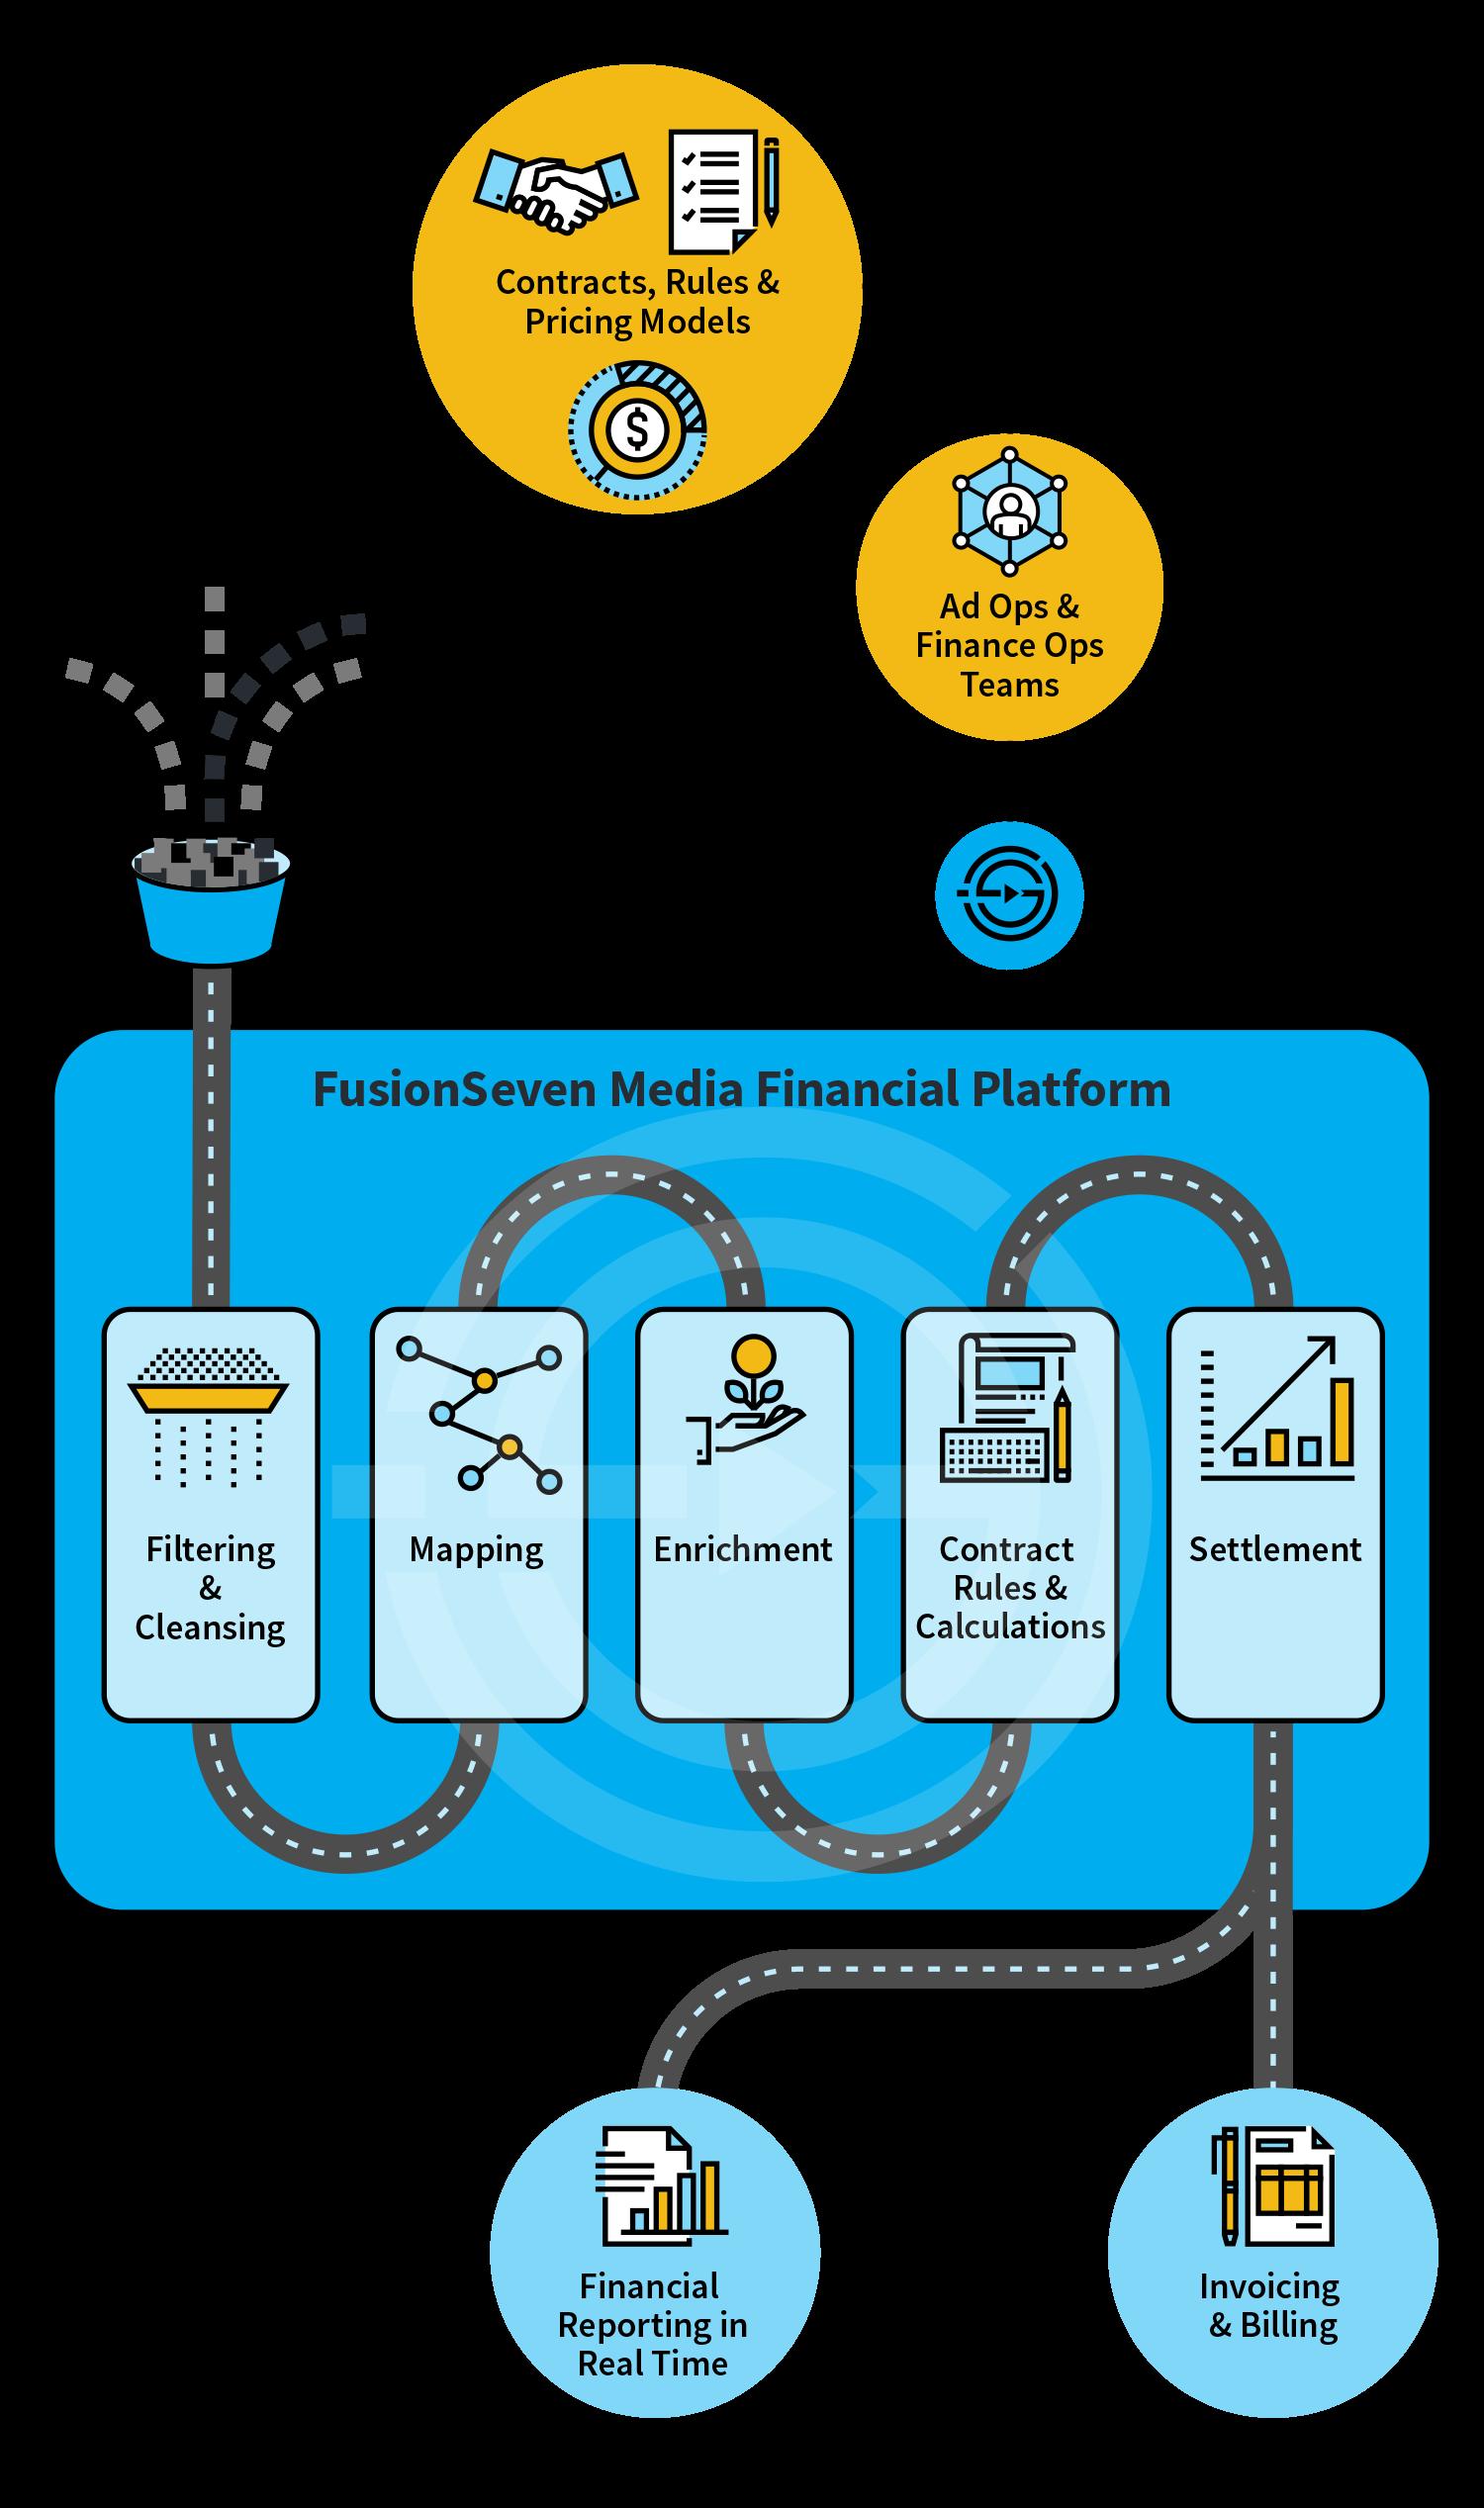 Fusion Seven Process Infographic